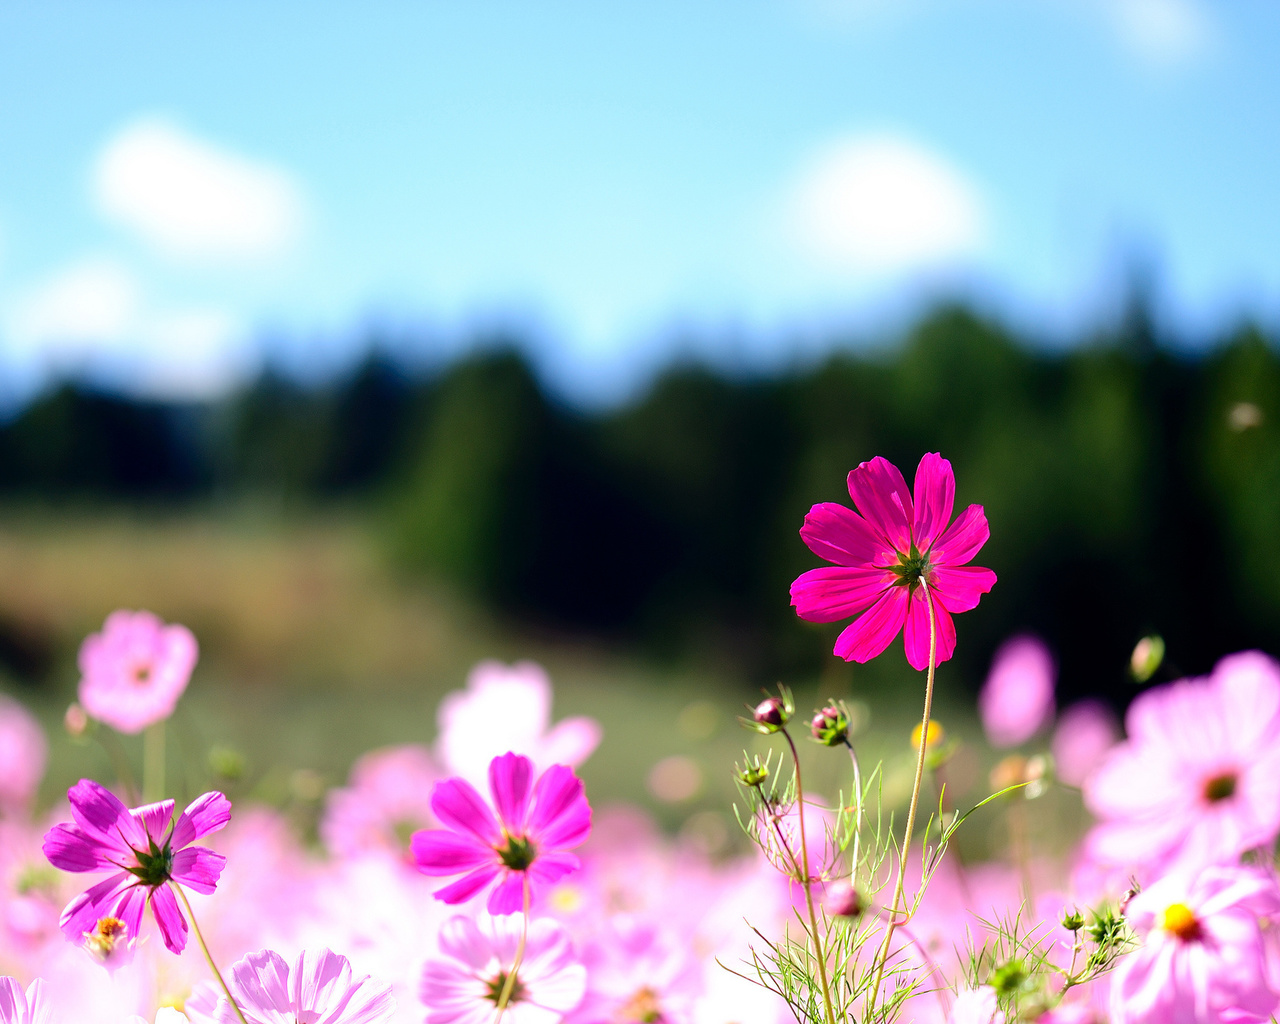 Картинки изображения лето